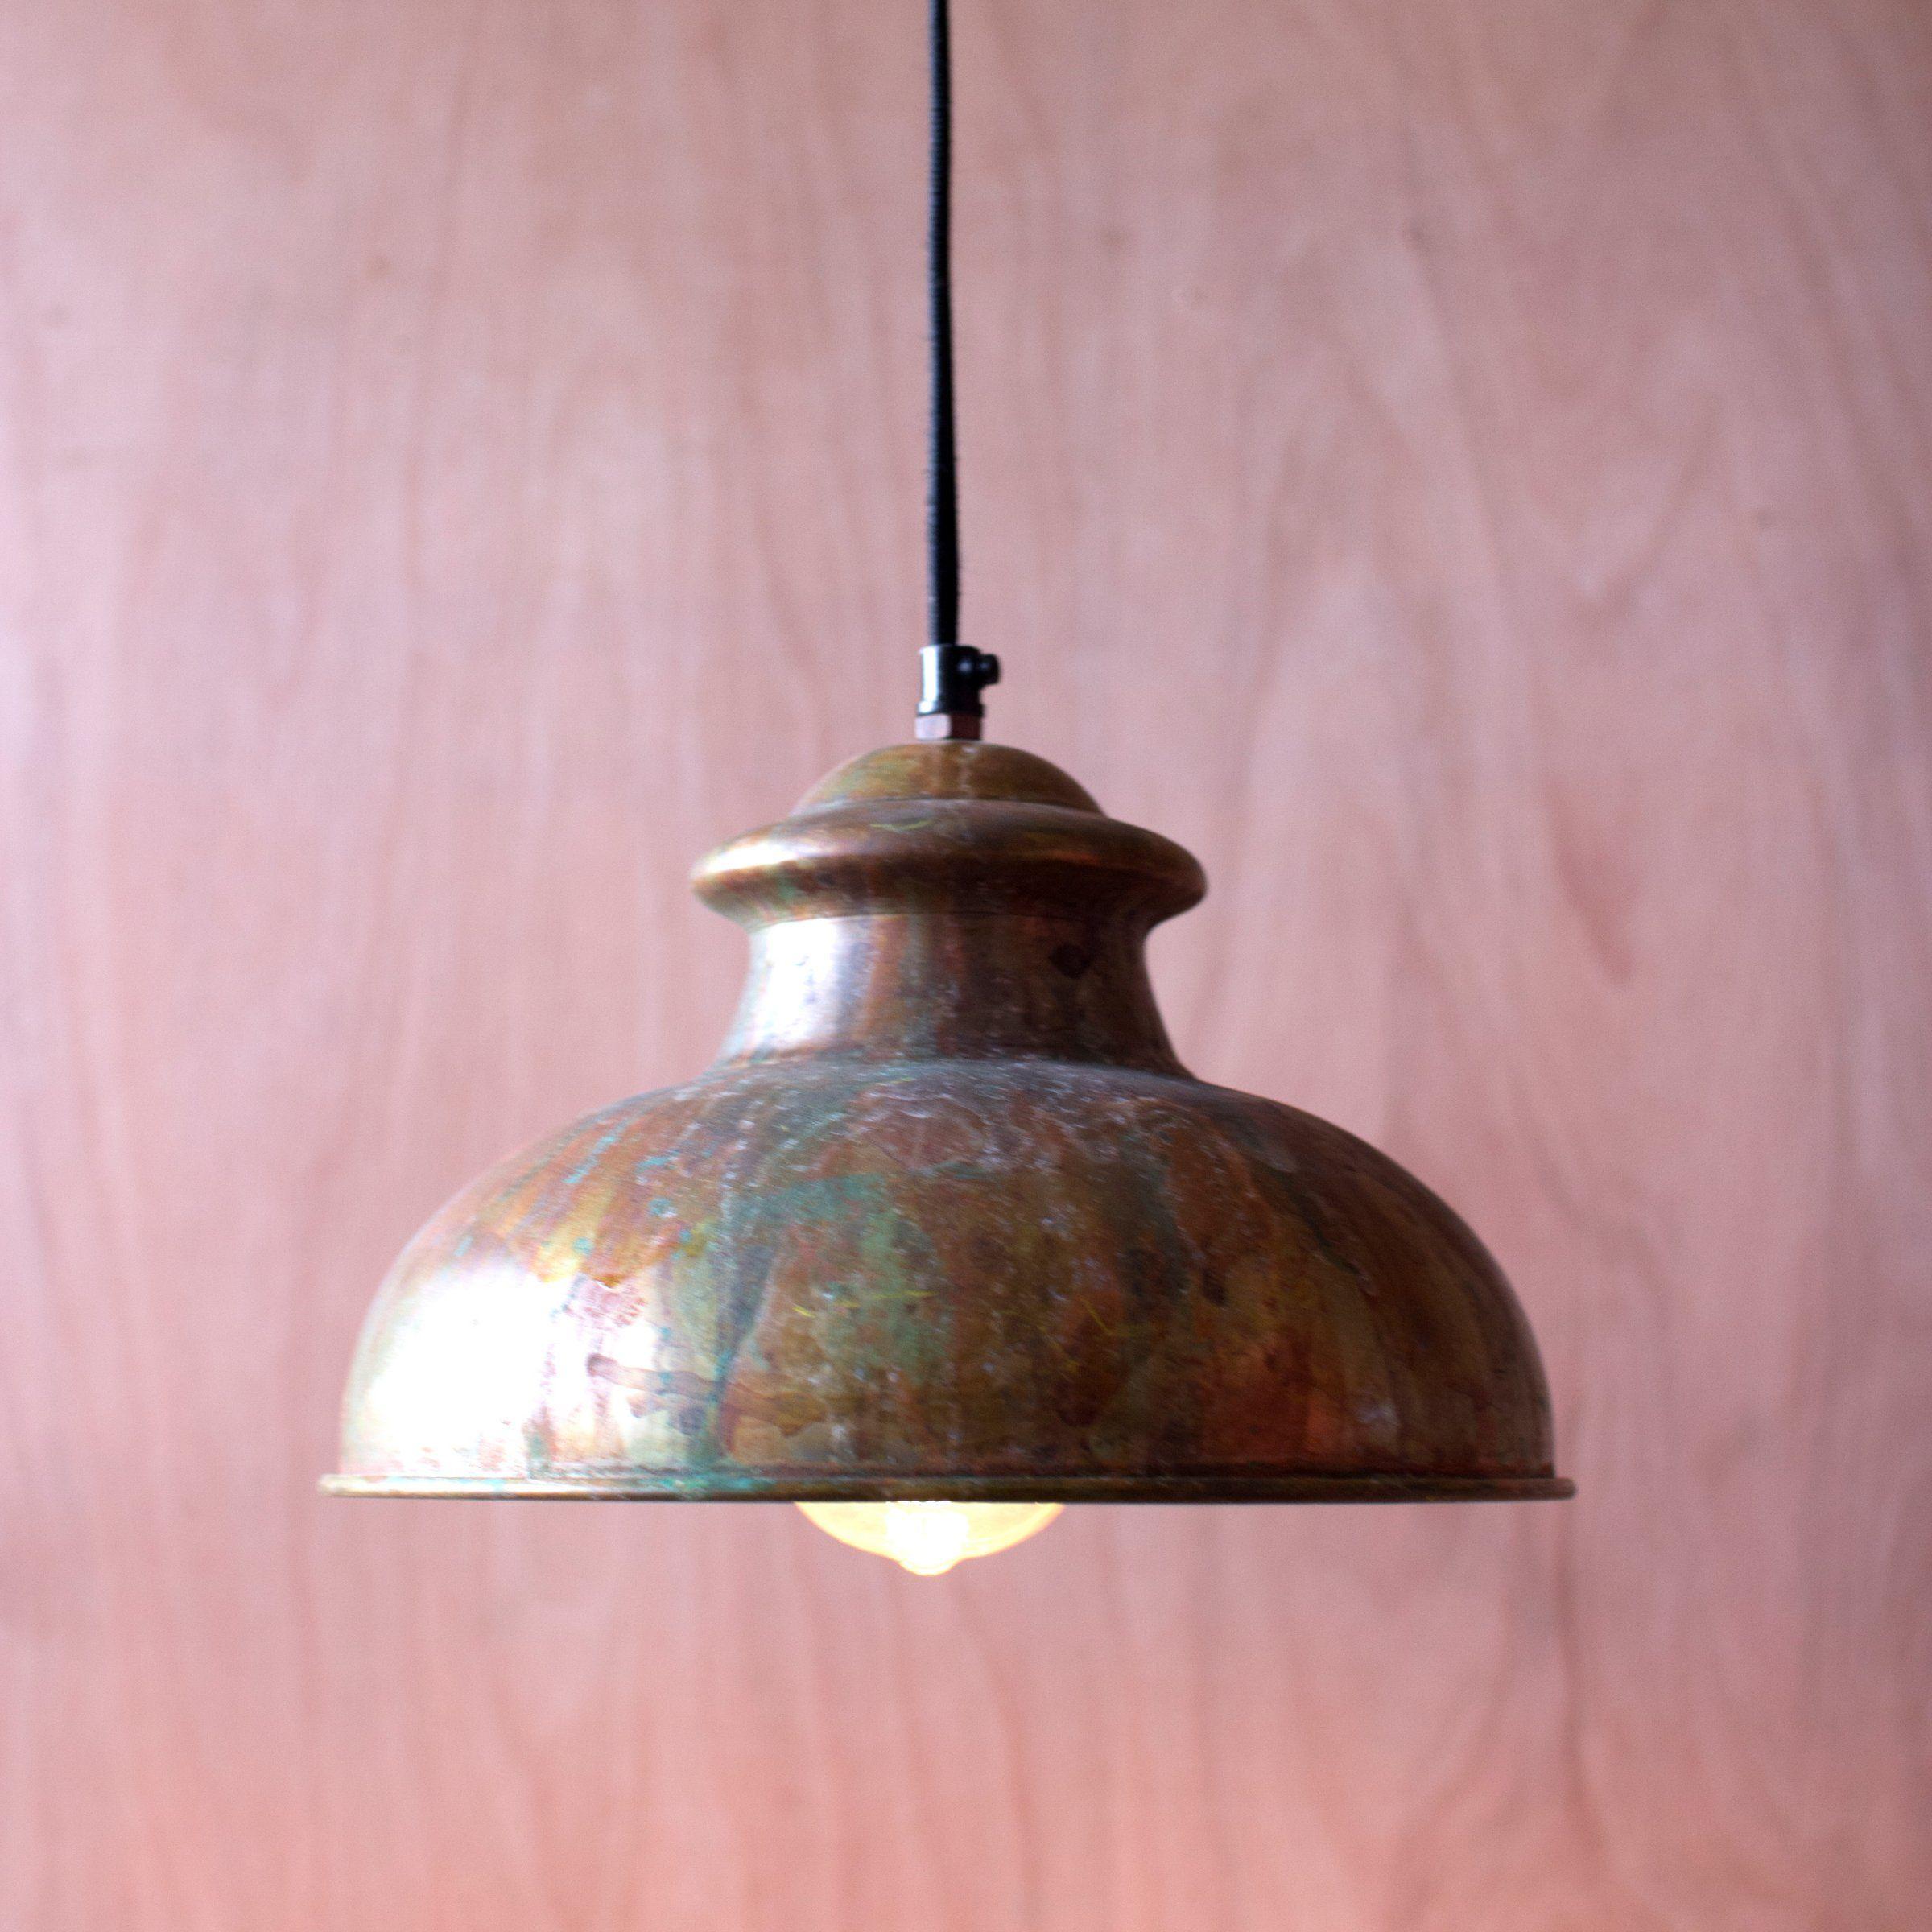 Kalalou Pendant No 8 Antique Rustic Pendant Lighting at